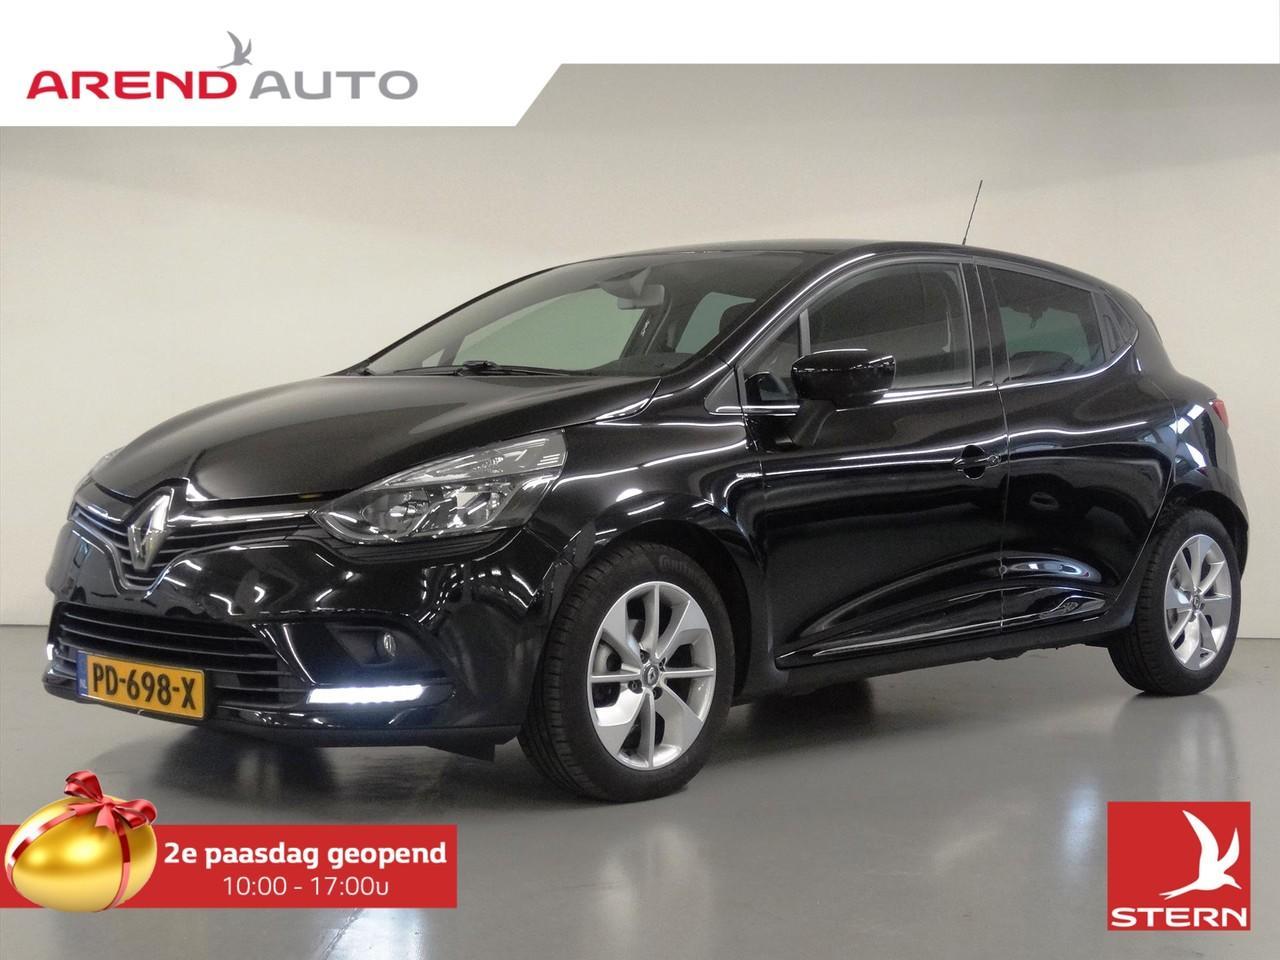 Renault Clio Energy dci 90pk eco2 s&s limited